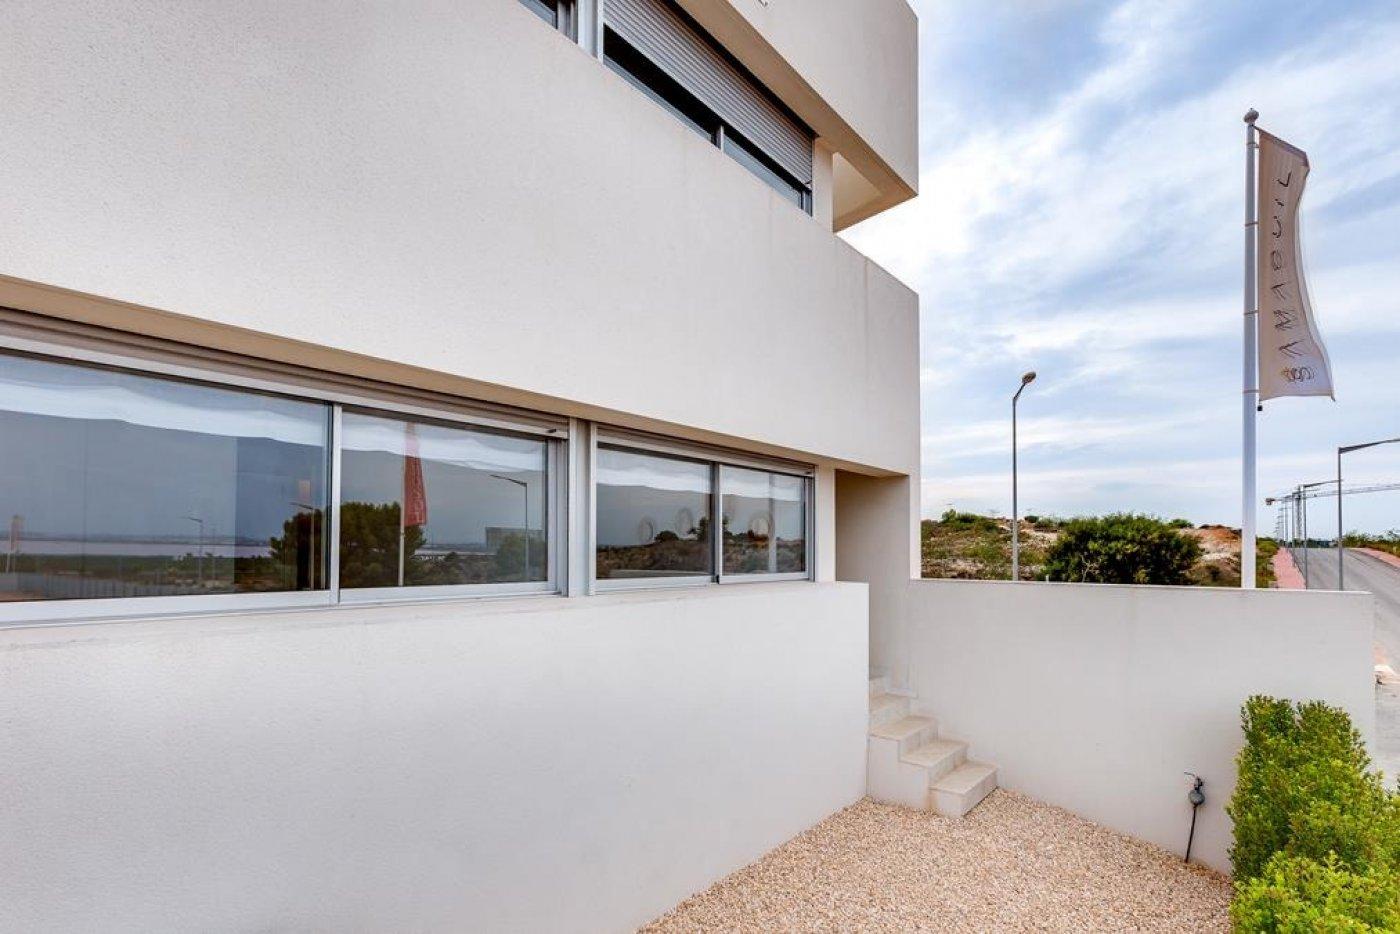 Apartment in Torrevieja Los balcones